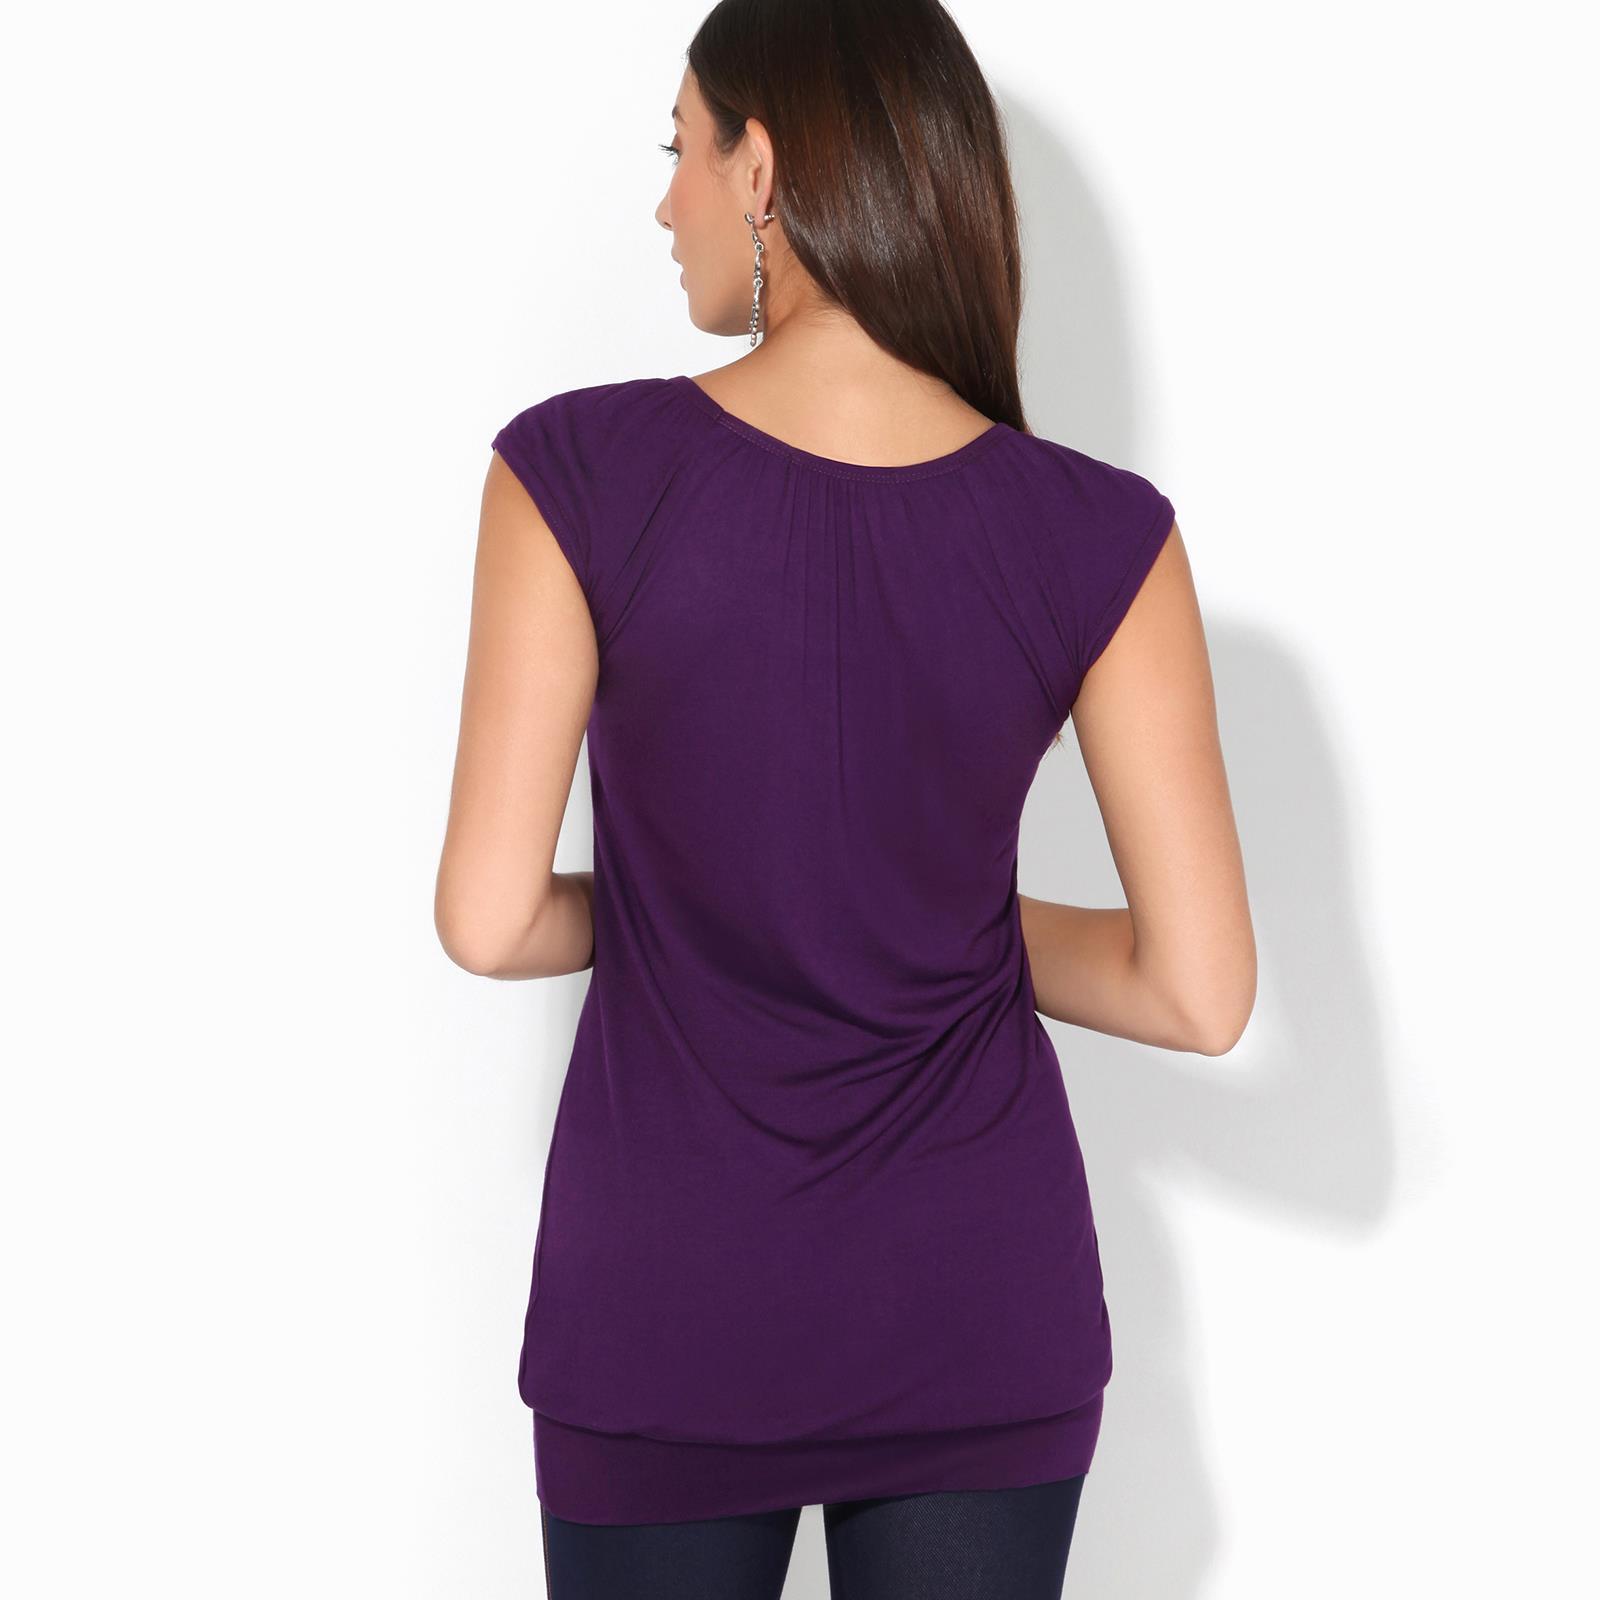 Womens-Ladies-Scoop-Neck-Blouse-V-T-Shirt-Long-Short-Sleeve-Plain-Loose-Top thumbnail 38